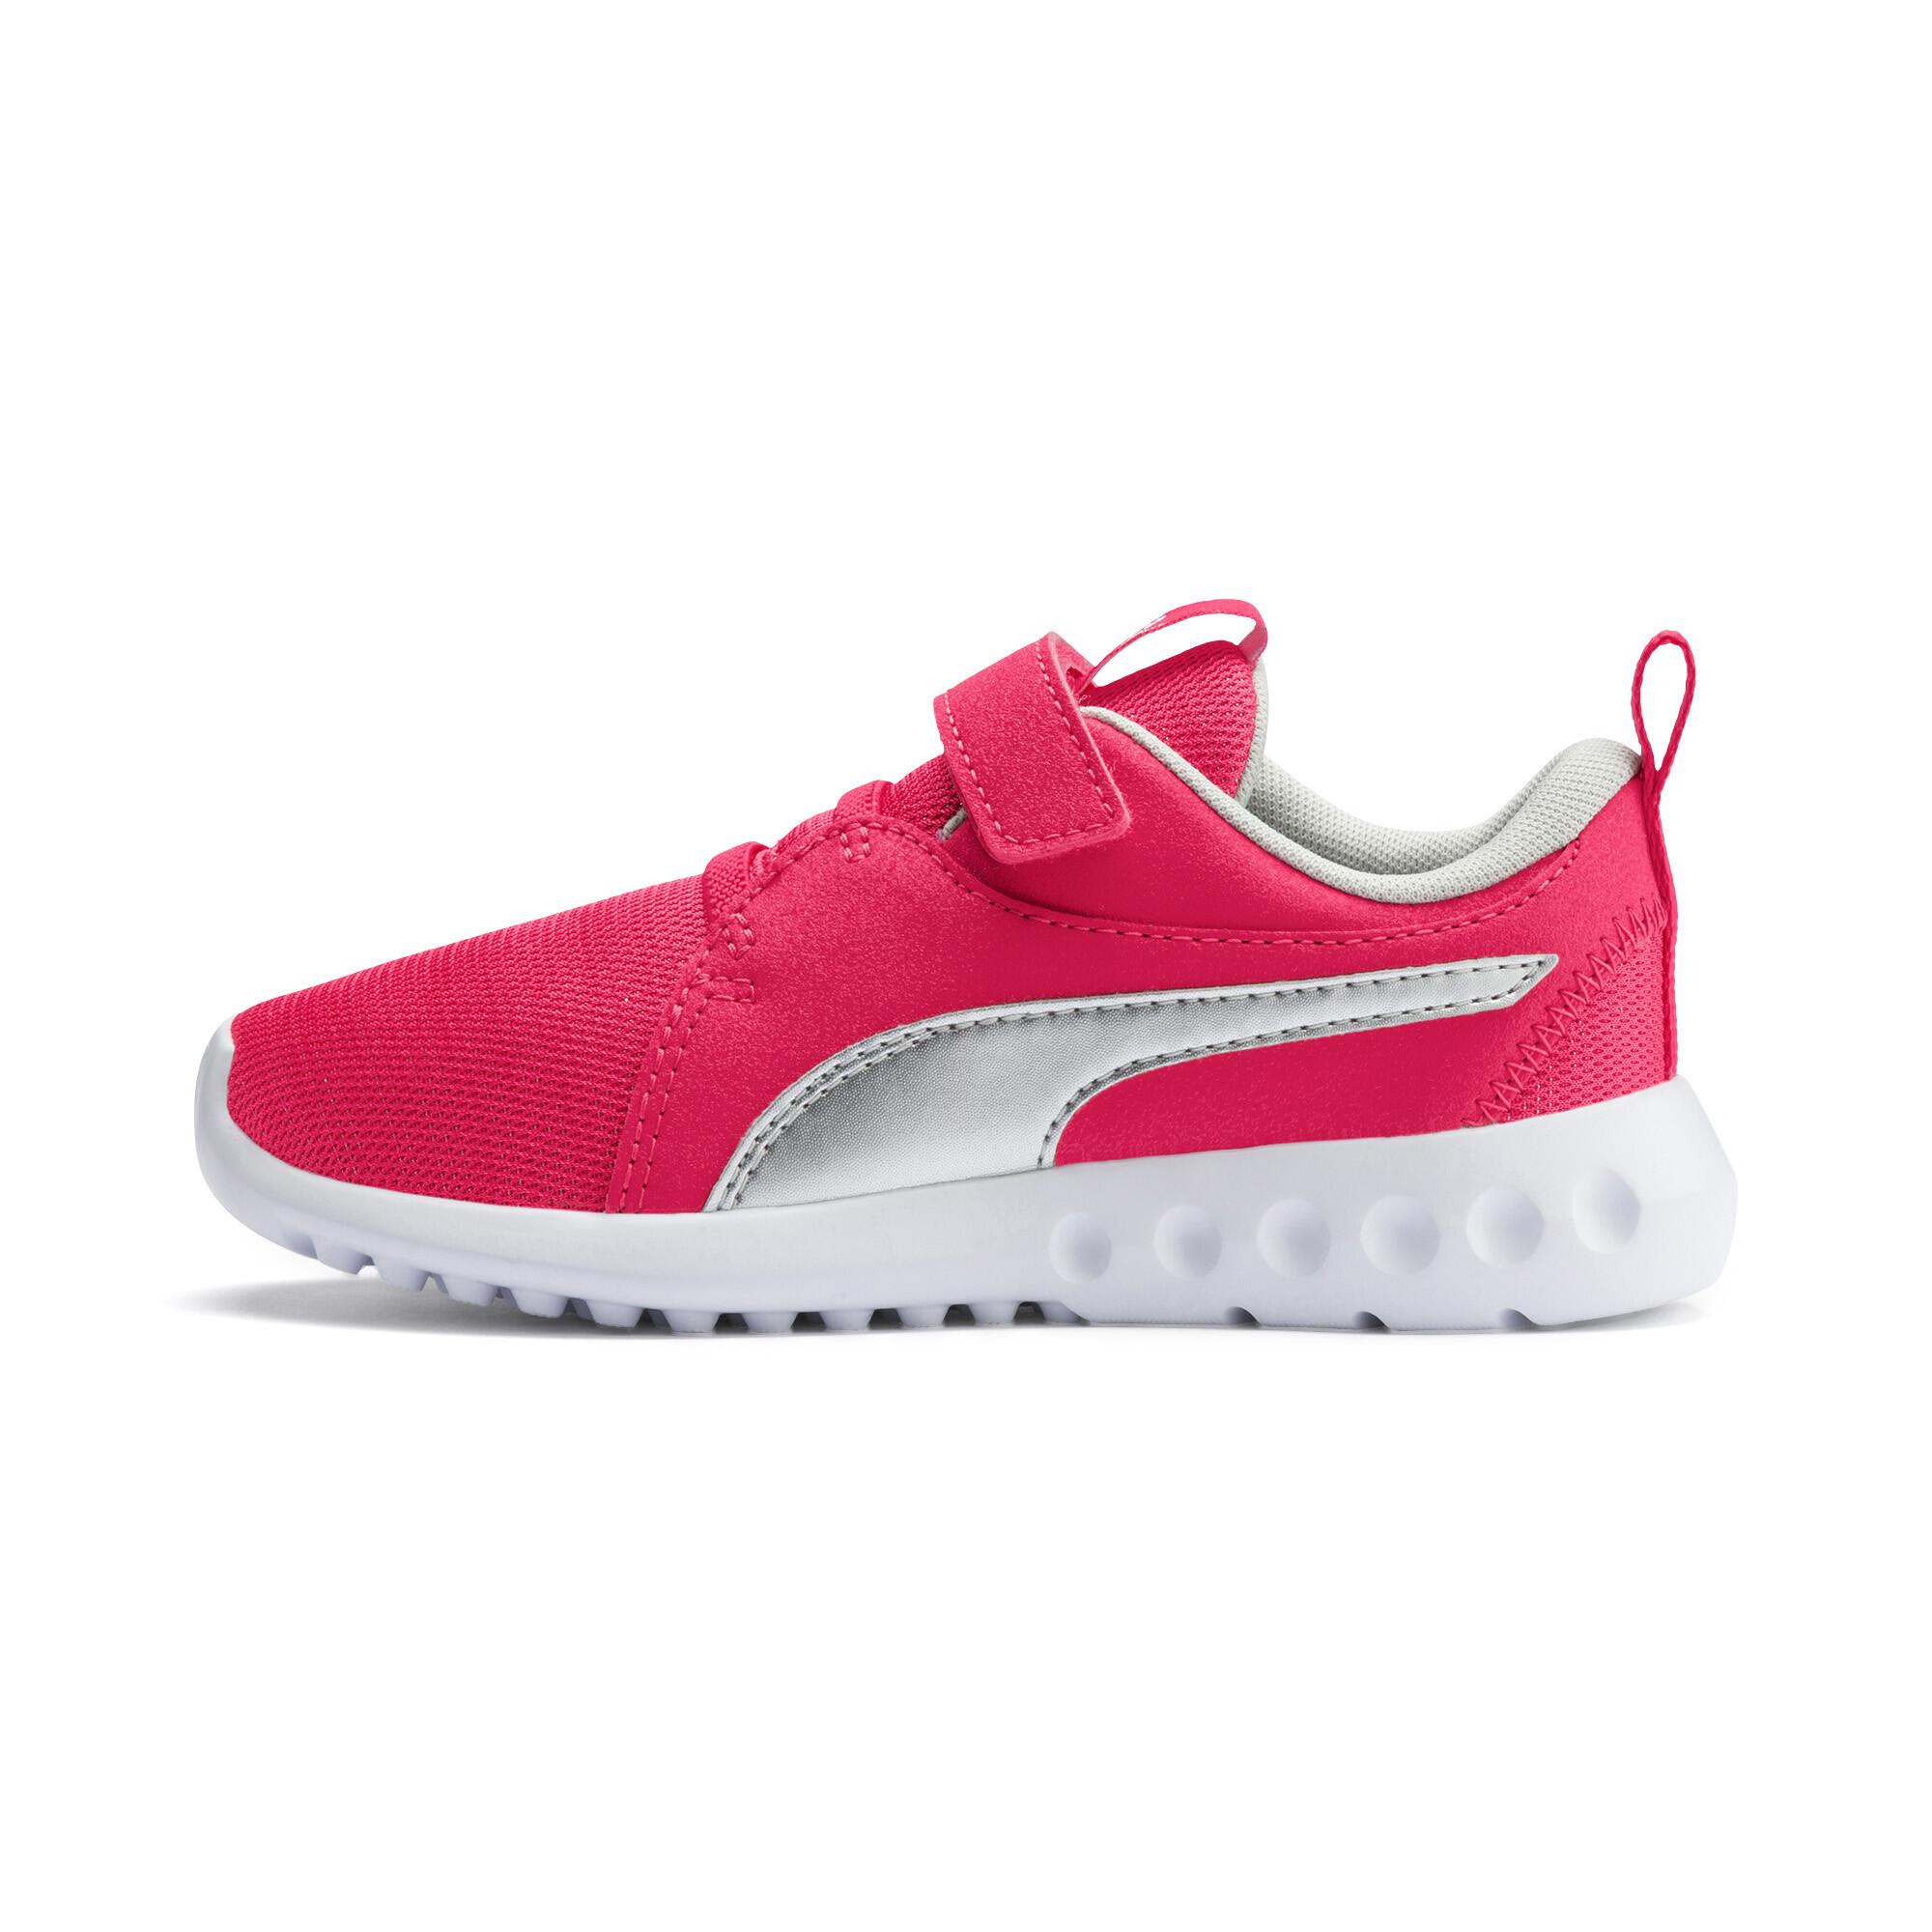 PUMA-Carson-2-Glitz-AC-Shoes-PS-Girls-Shoe-Kids thumbnail 4